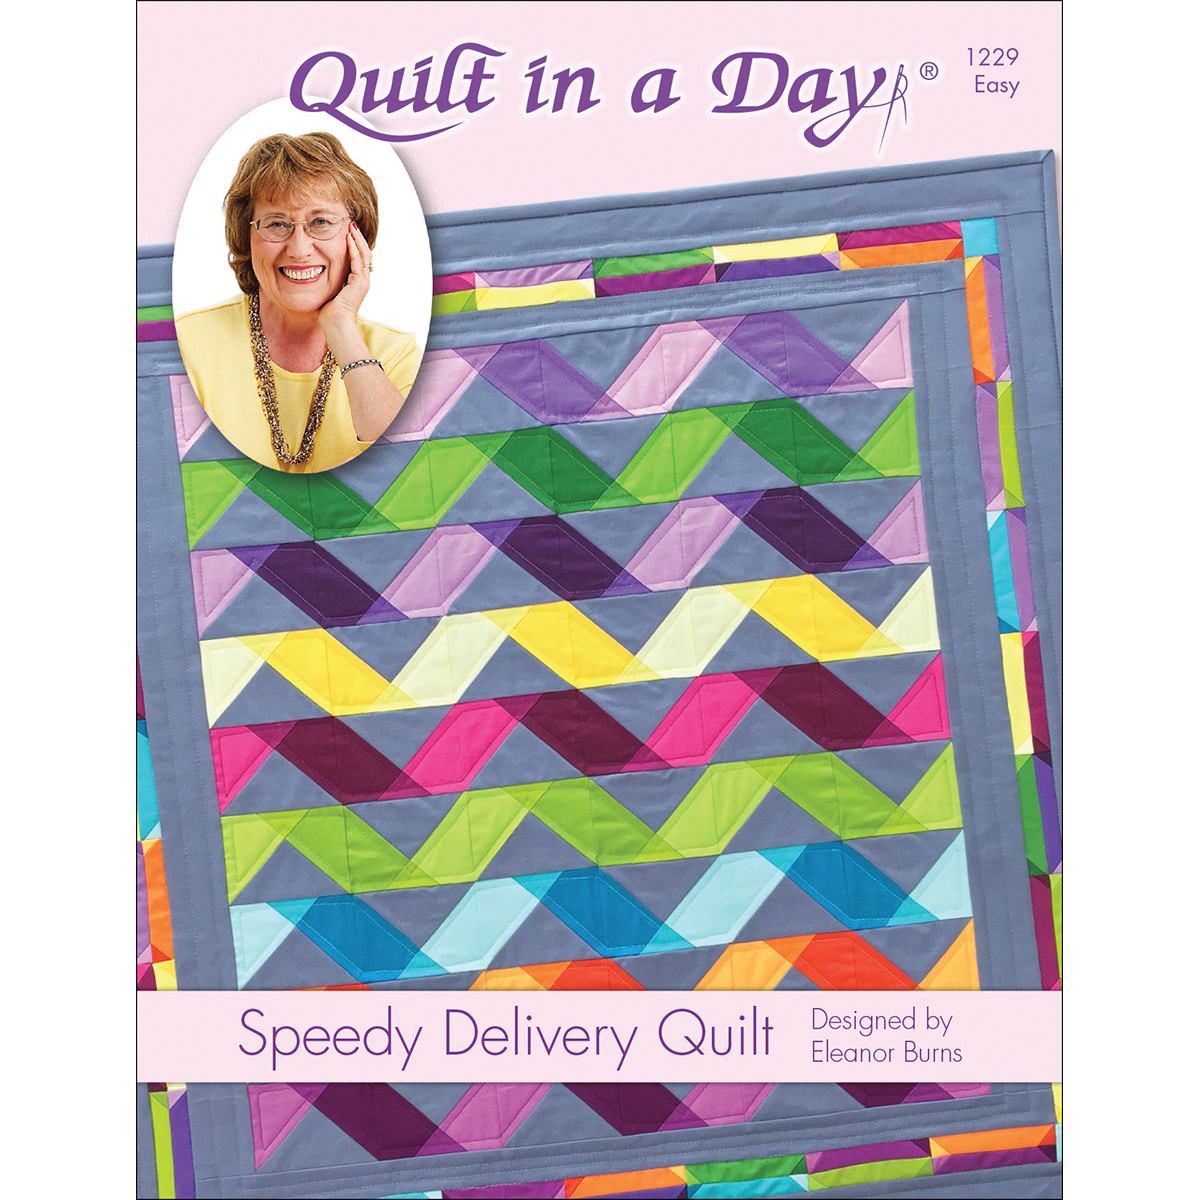 Eleanor Burns Patterns-Speedy Delivery Quilt